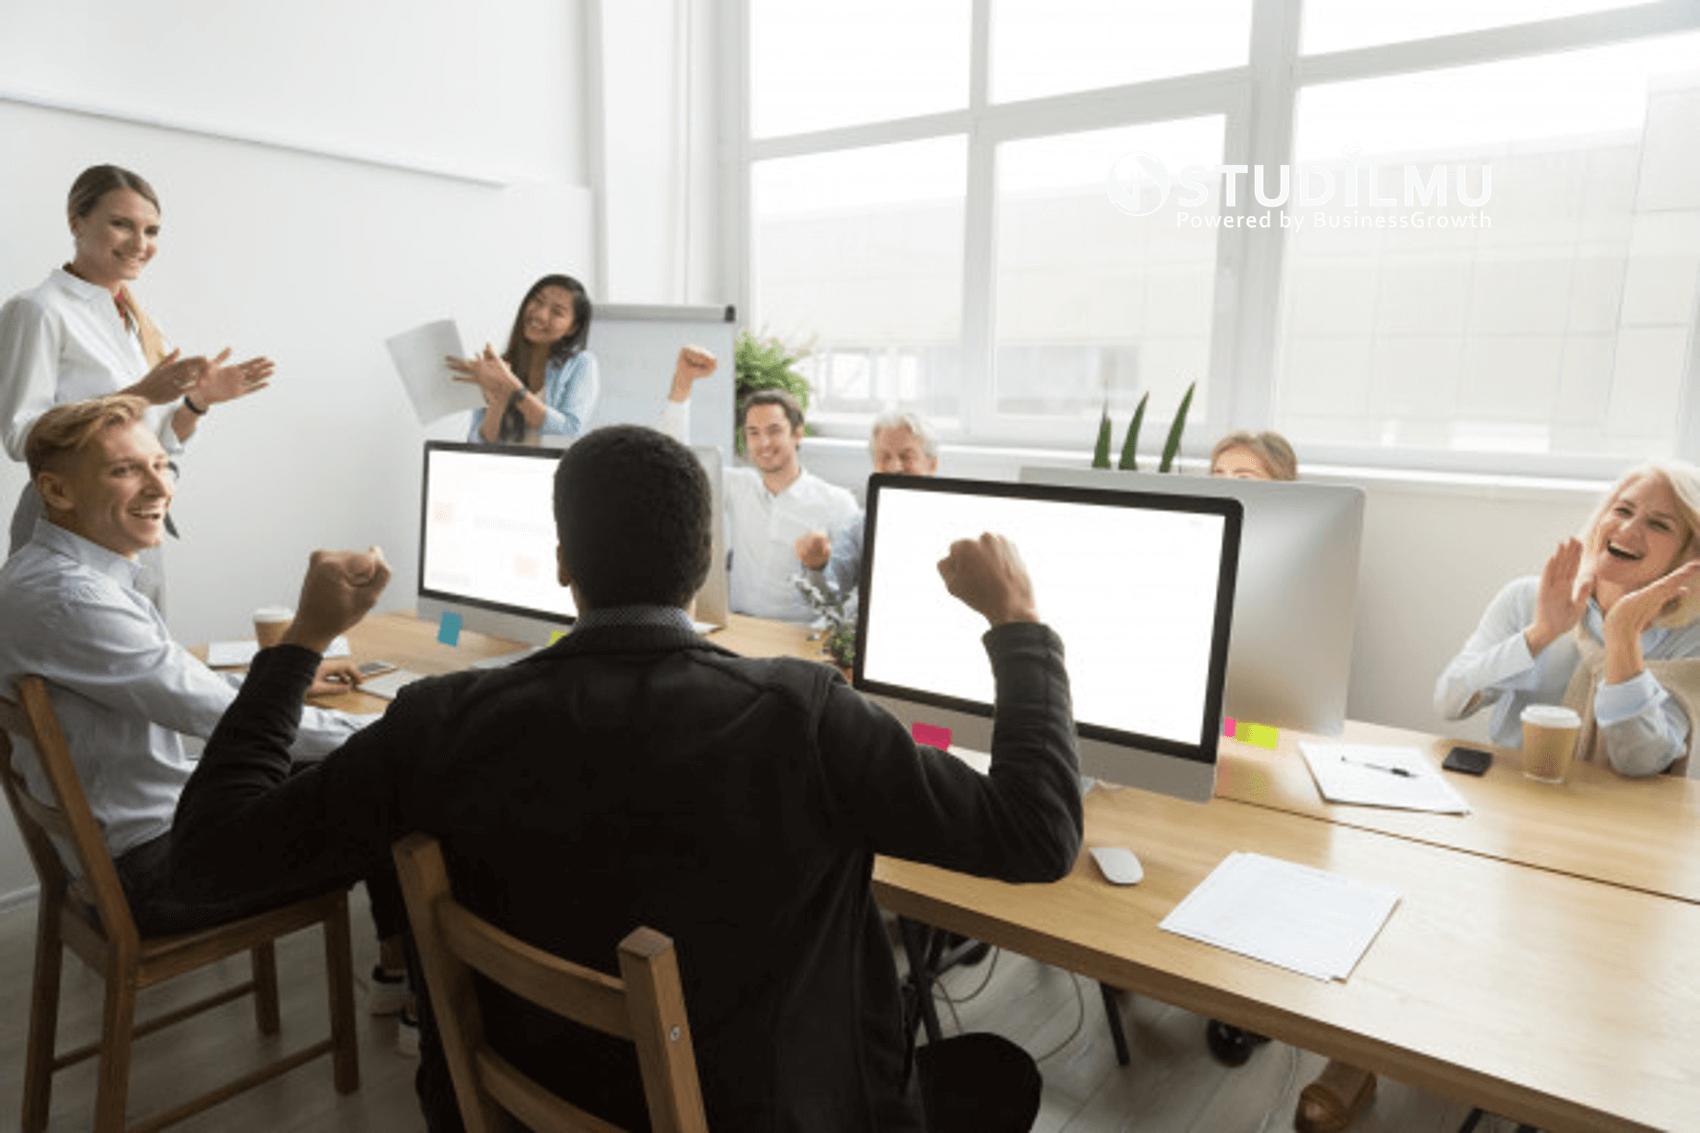 STUDILMU Career Advice - 15 Pertanyaan Untuk Meningkatkan Semangat Kerja, Moral & Budaya Kerja